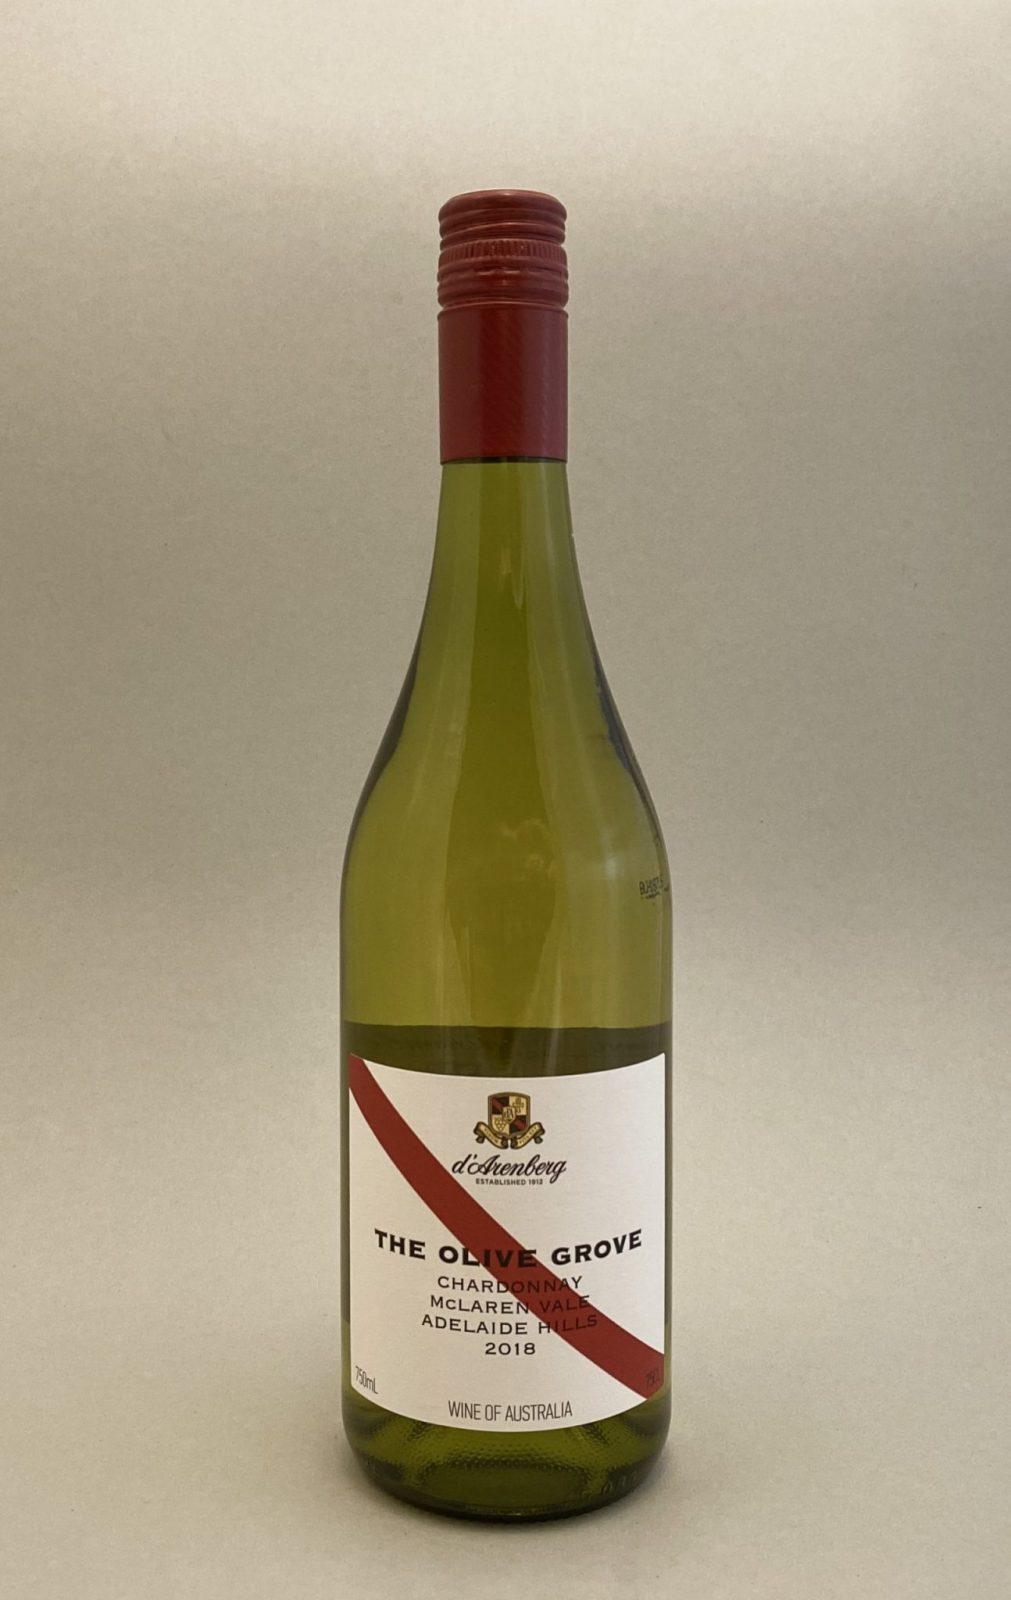 THE OLIVE GROVE Chardonnay 2018, vinoteka Bratislava slnecnice mesto, petrzalka, vino biele z Australie